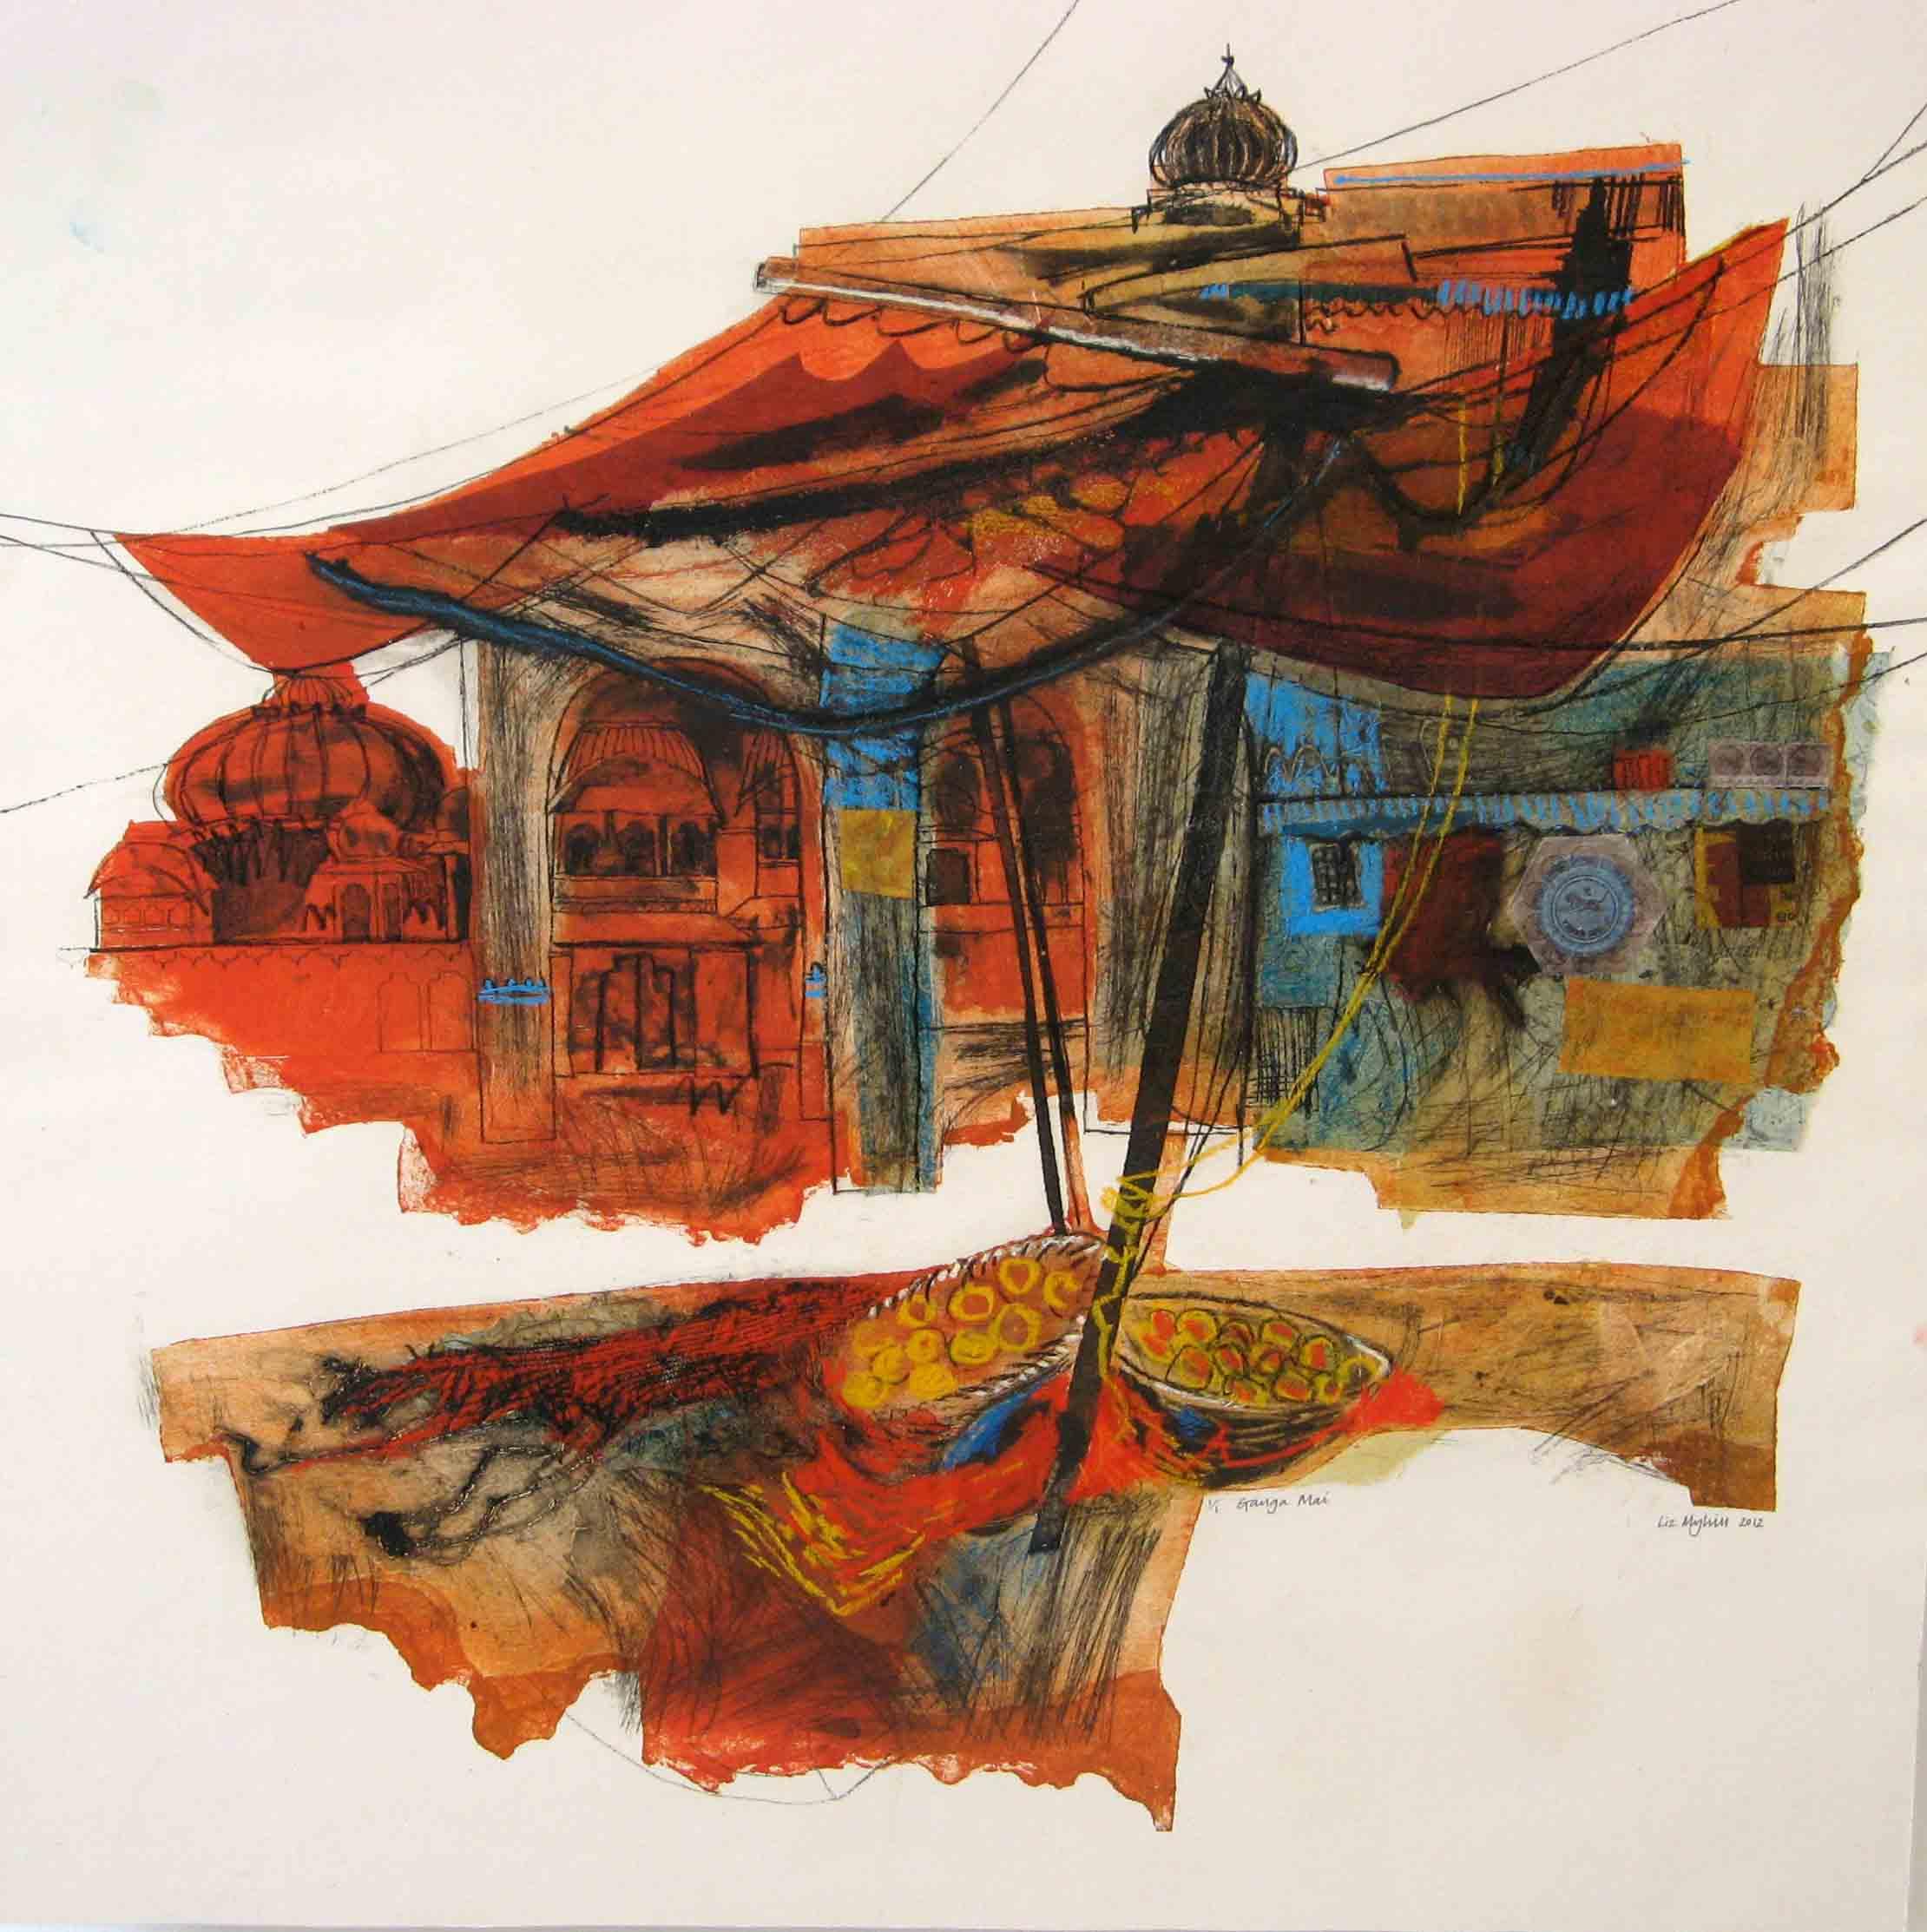 Ganga Mai Through the Awnings